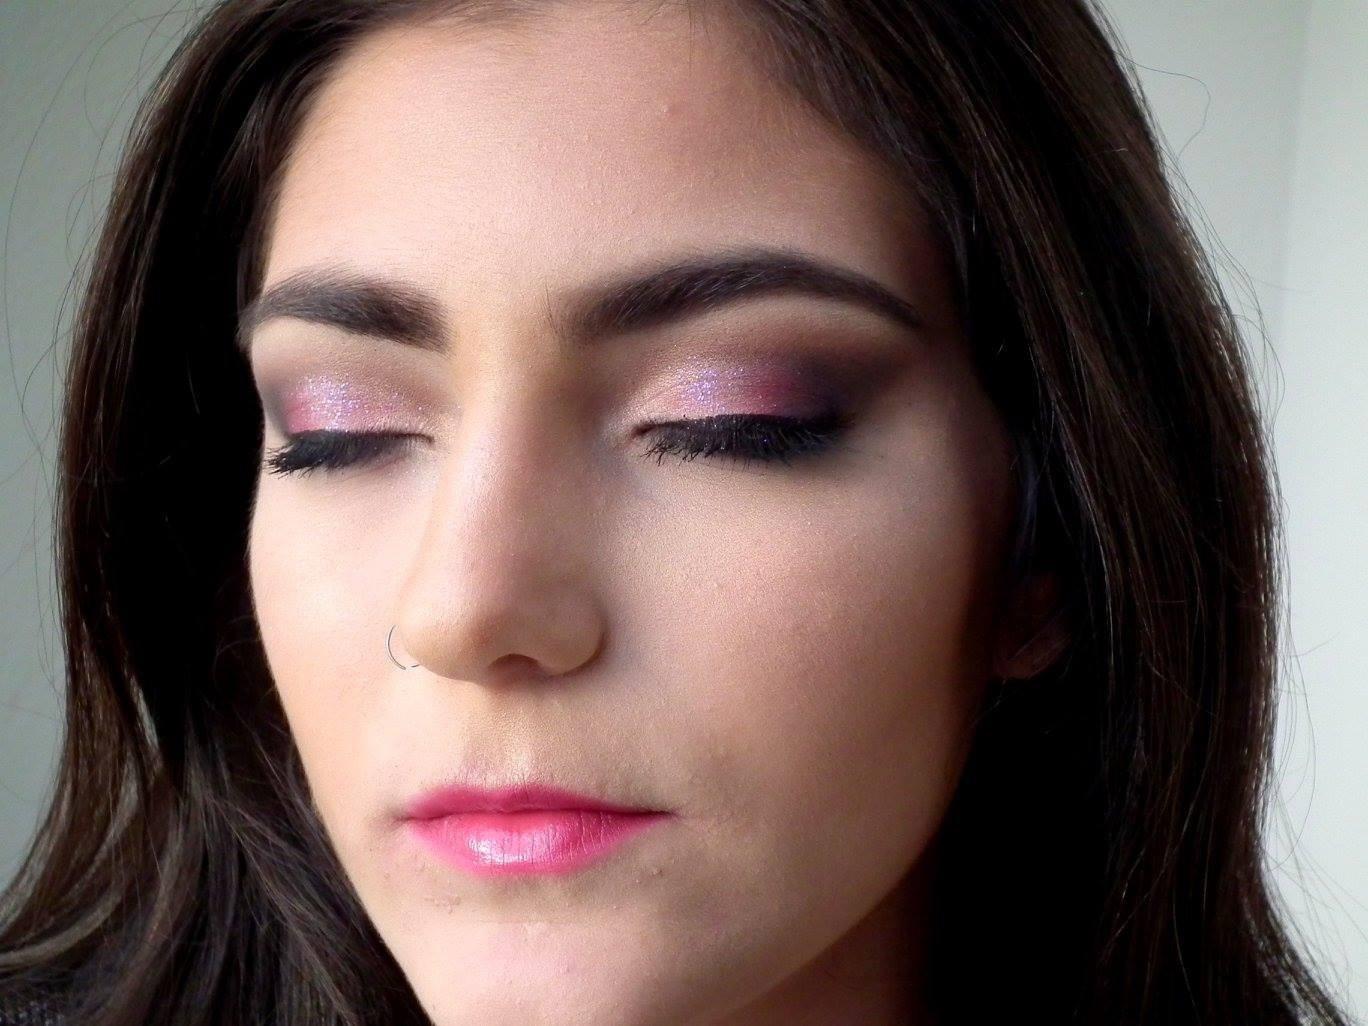 #maquiagem #makeup #beauty #mua  maquiagem maquiador(a)